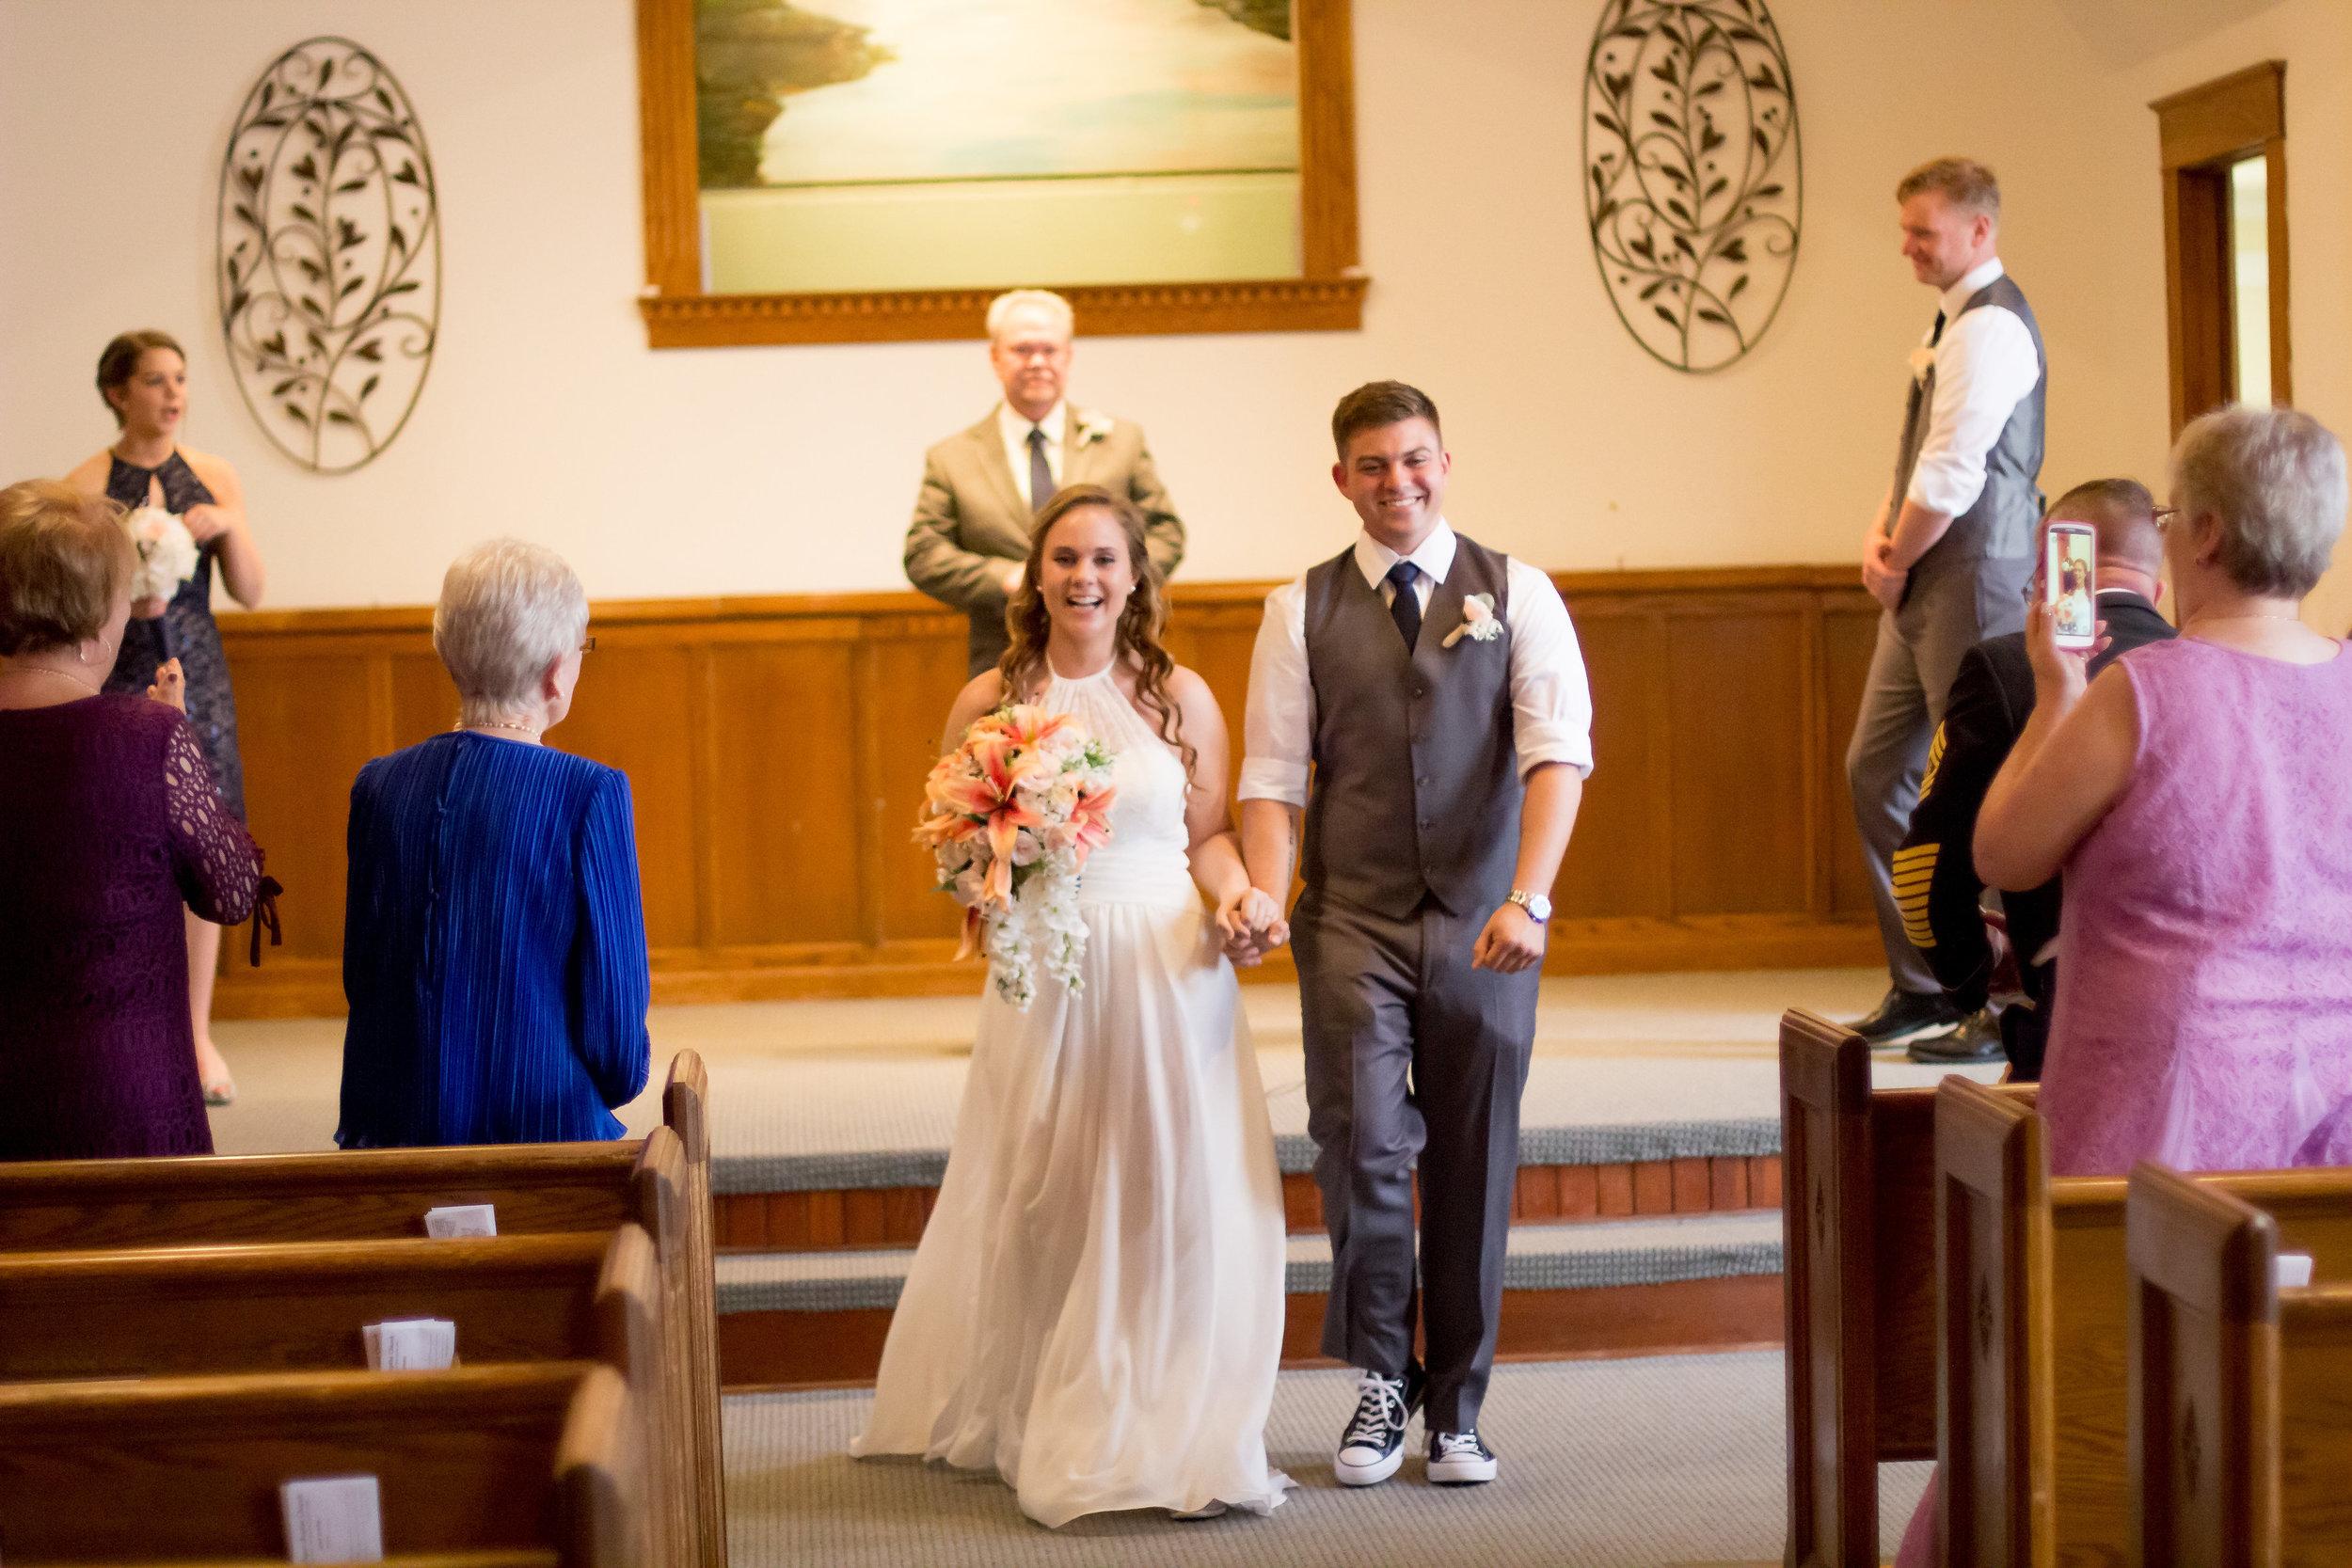 Sydni & Alex | Southport Beach NC Wedding | Bryant Tyson Photographer | Greenville + Eastern NC Wedding Portraits | www.imbryantdevon.com